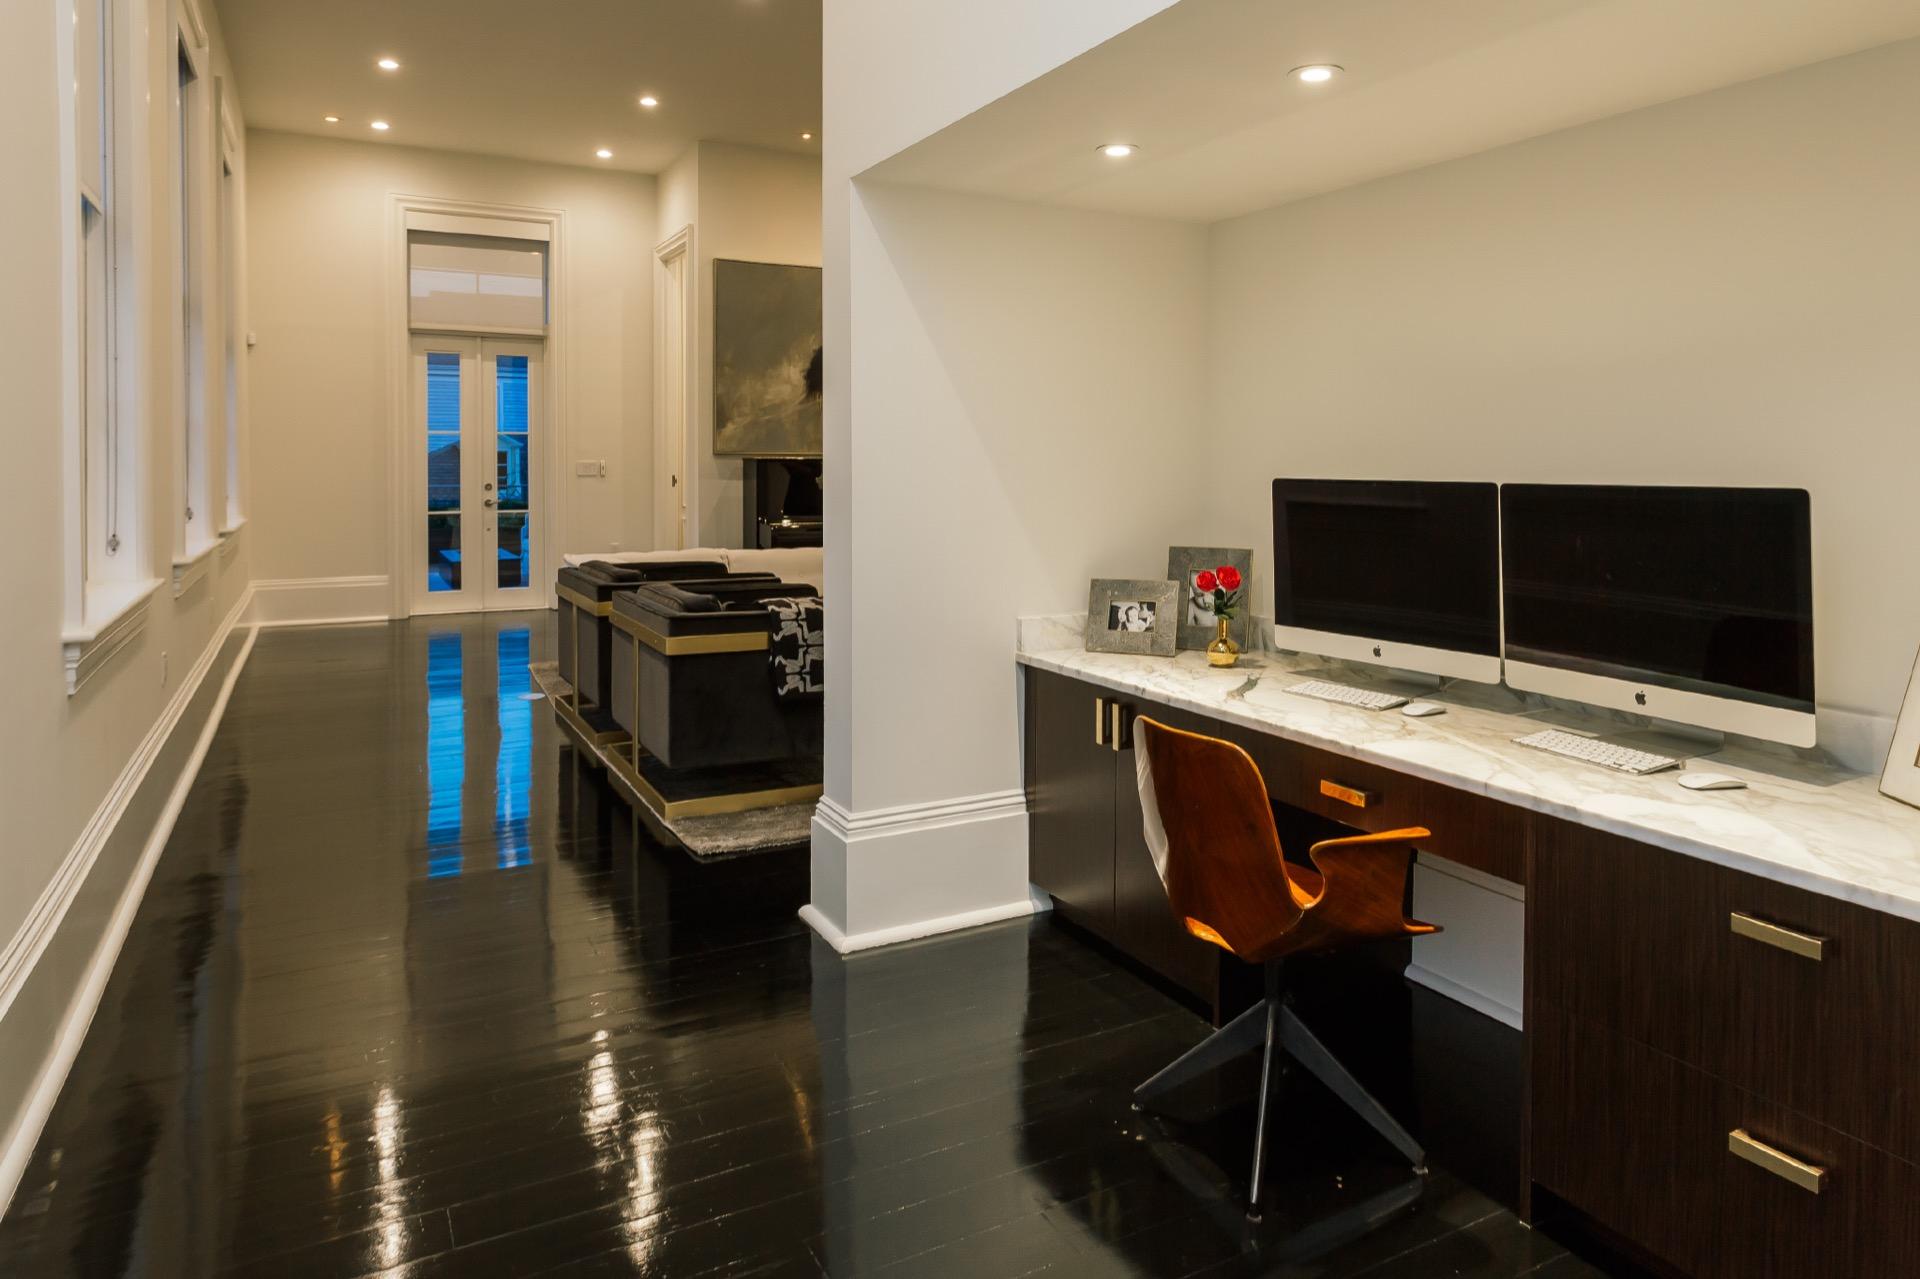 Tara shaw interior design new orleans contemporary for Interior designs new orleans